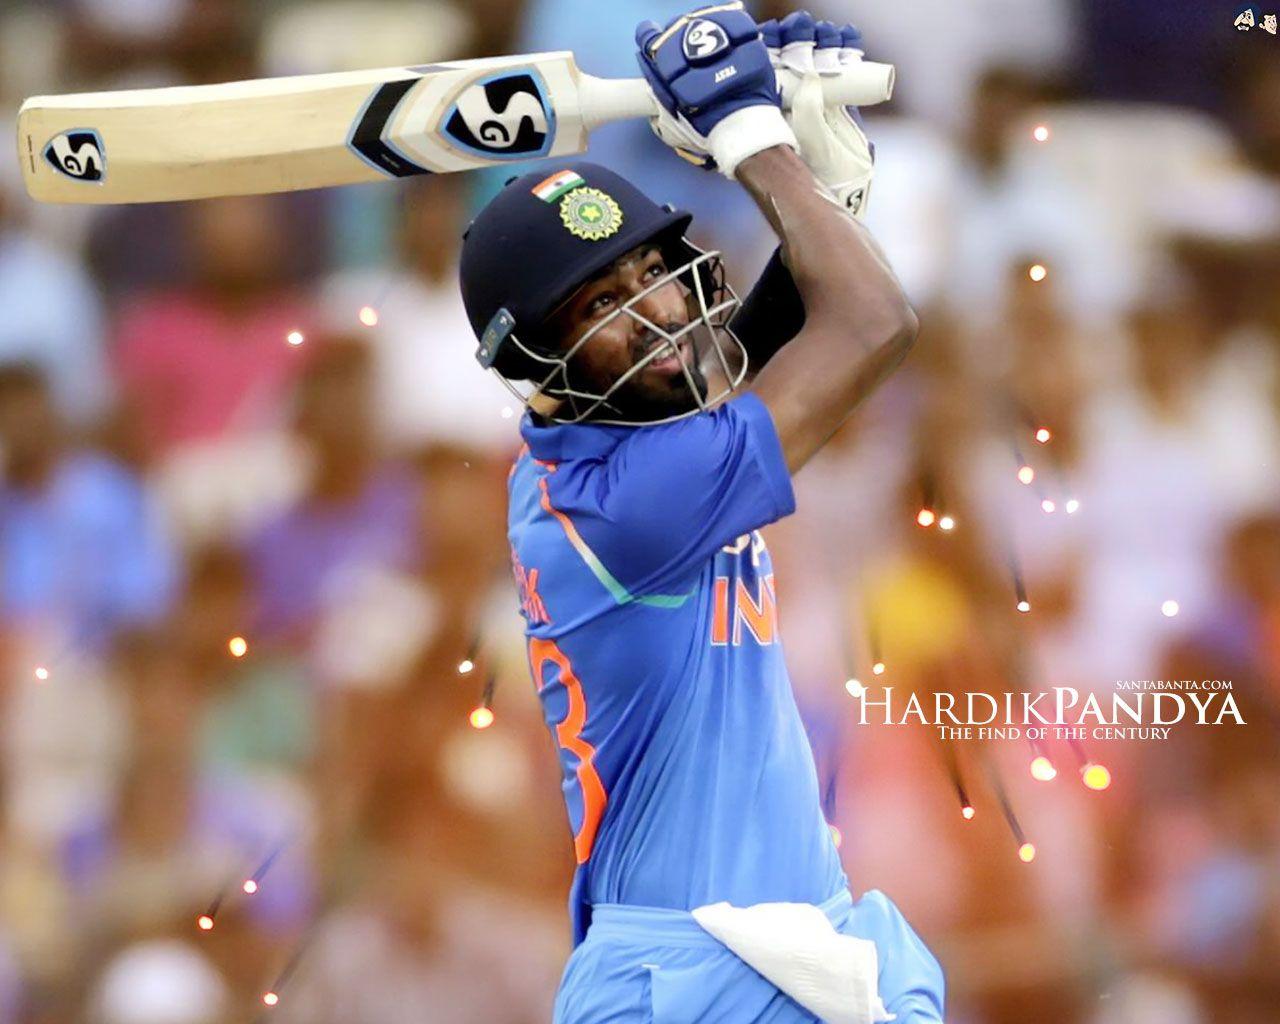 Hardik Pandya 1280x1024 Wallpaper 2 Cricket Wallpapers Cricket Logo Cricket